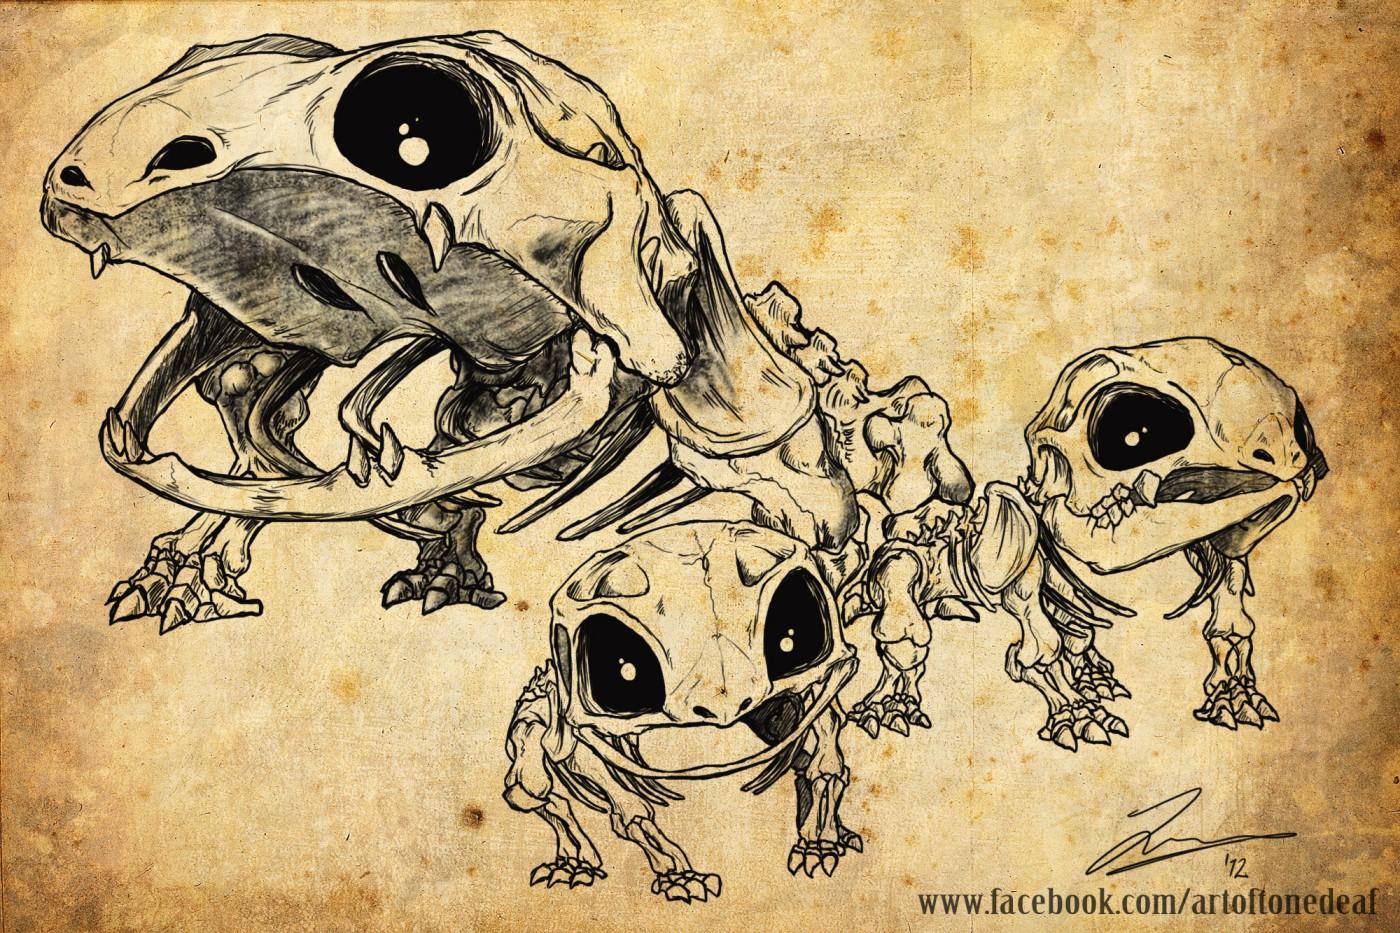 Bulbasaur evolutions skeletons by acidic055